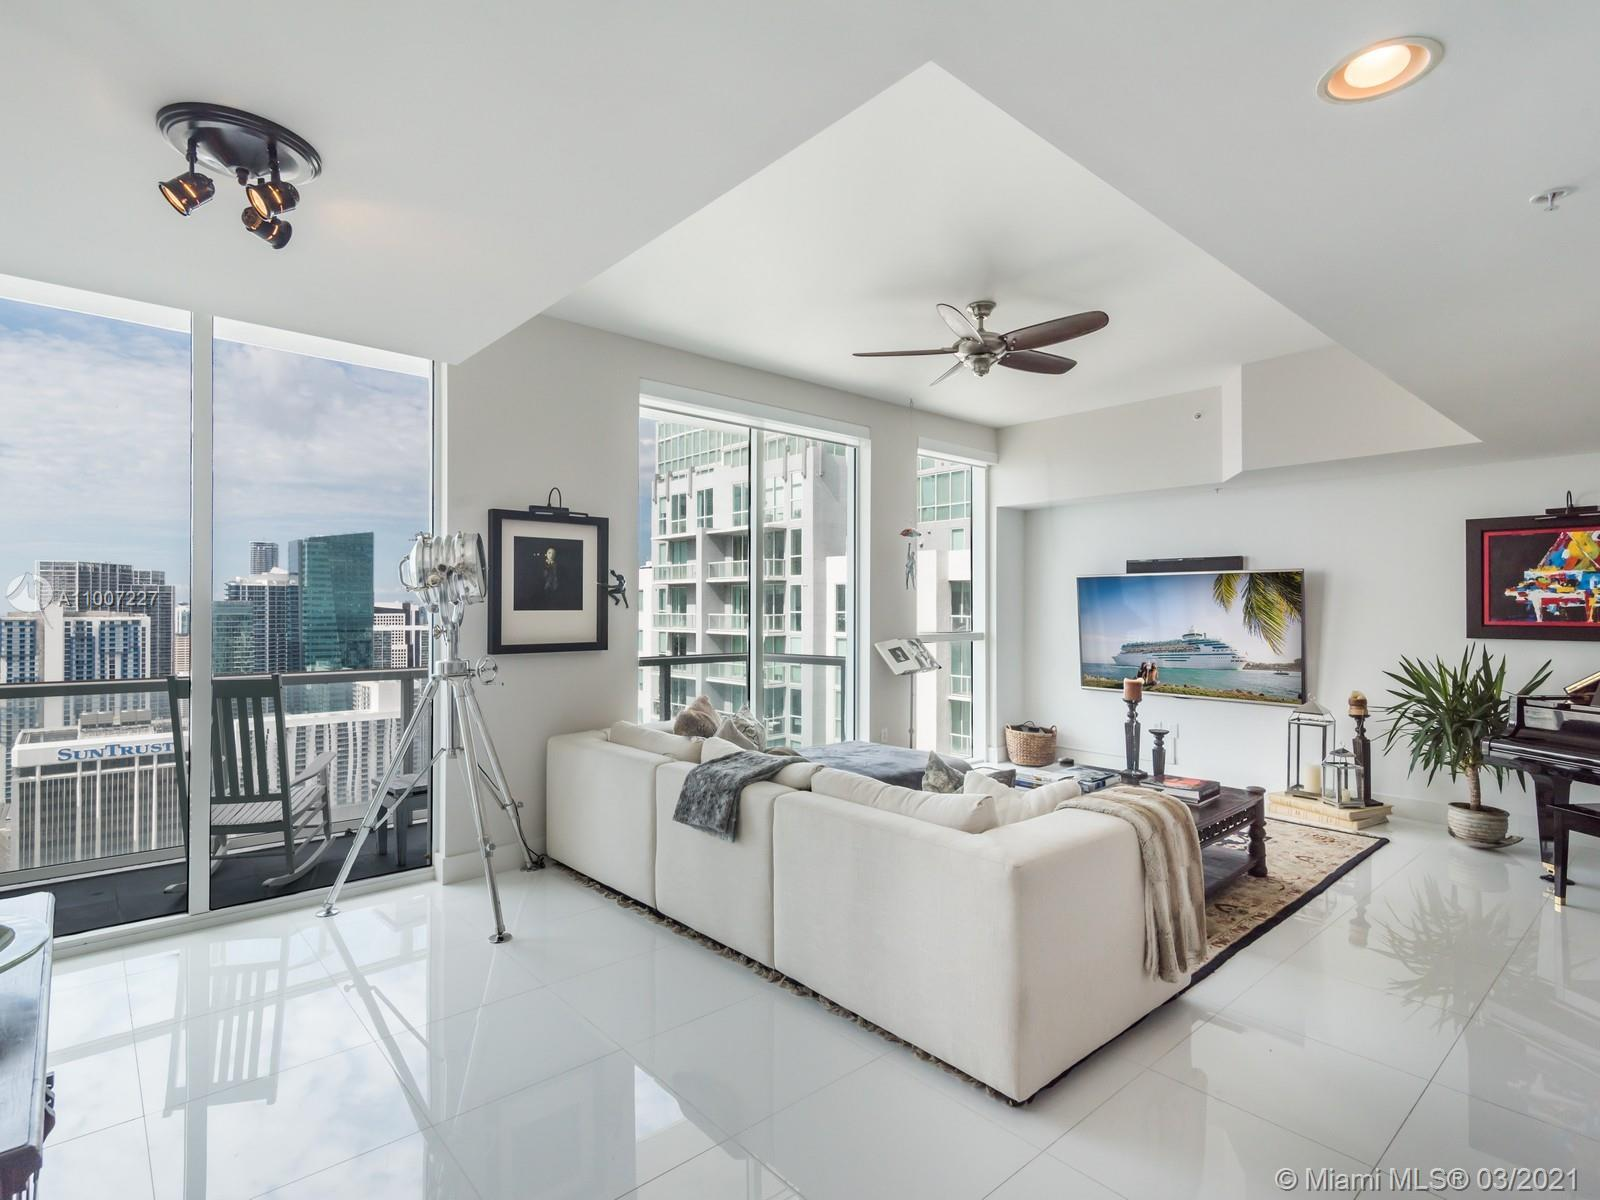 Vizcayne One #4907 - 244 Biscayne Blvd #4907, Miami, FL 33132